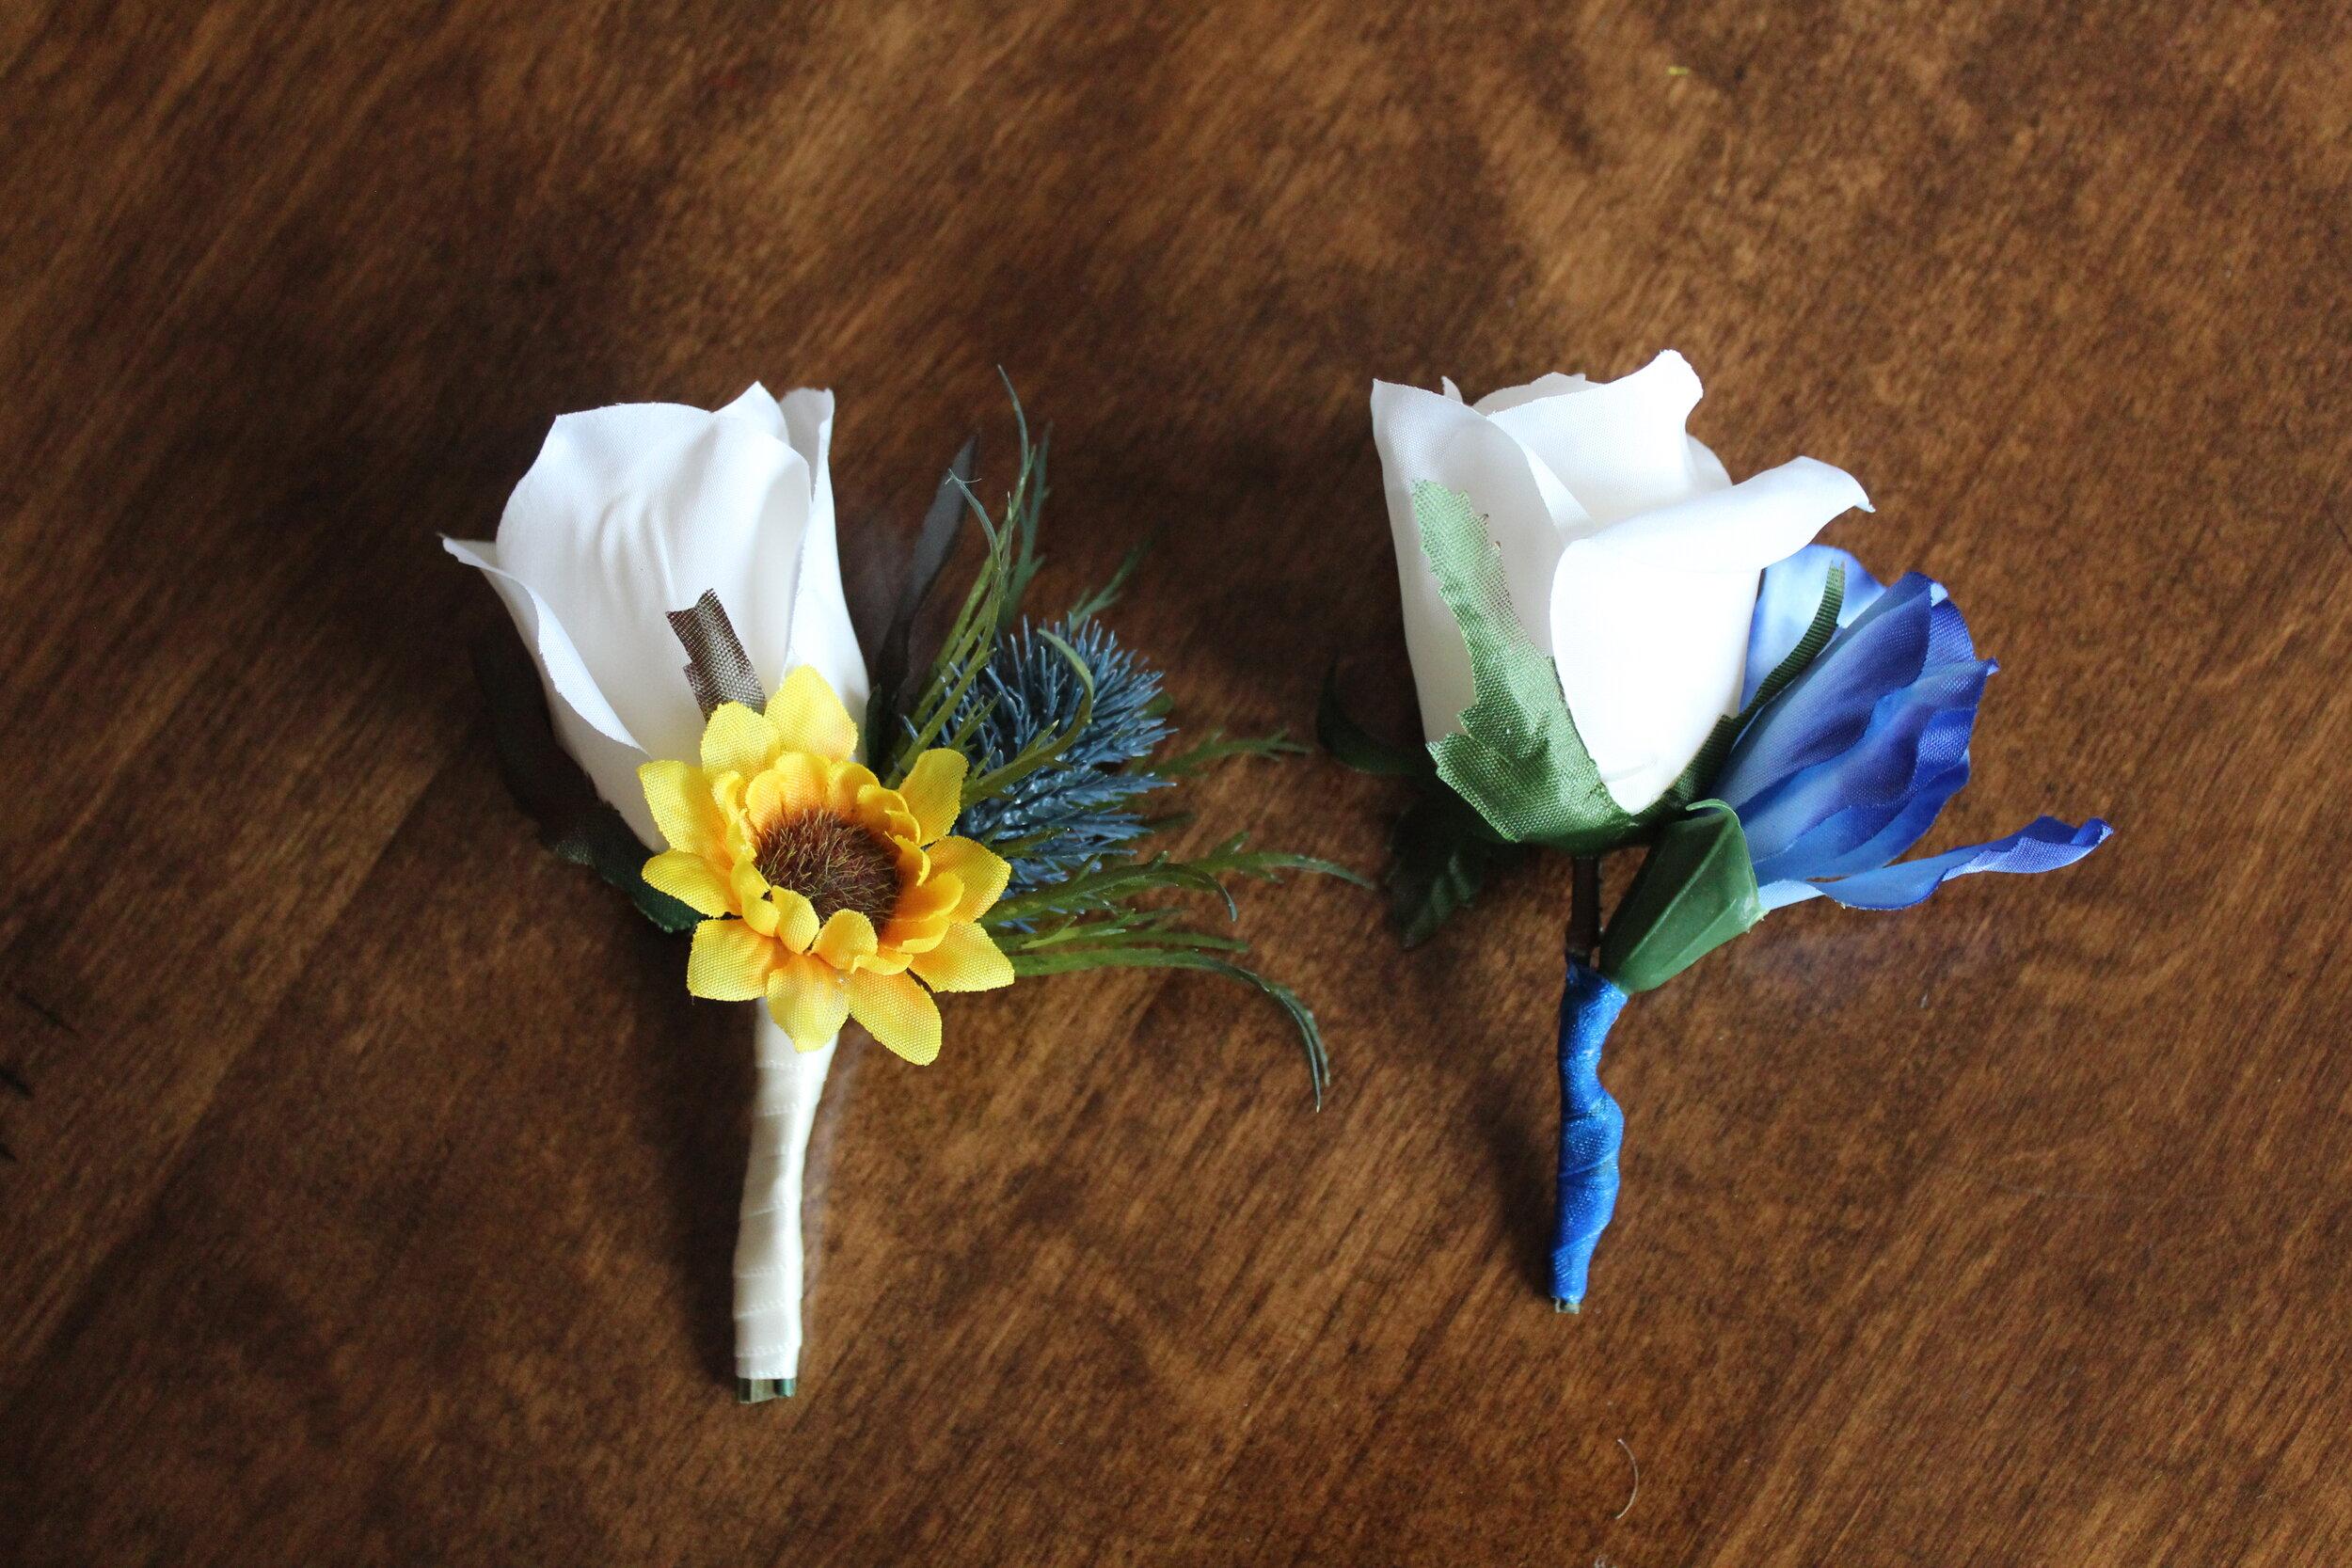 silk-boutonnieres-corsages-wedding-flowers-bridal-bouquet.jpg